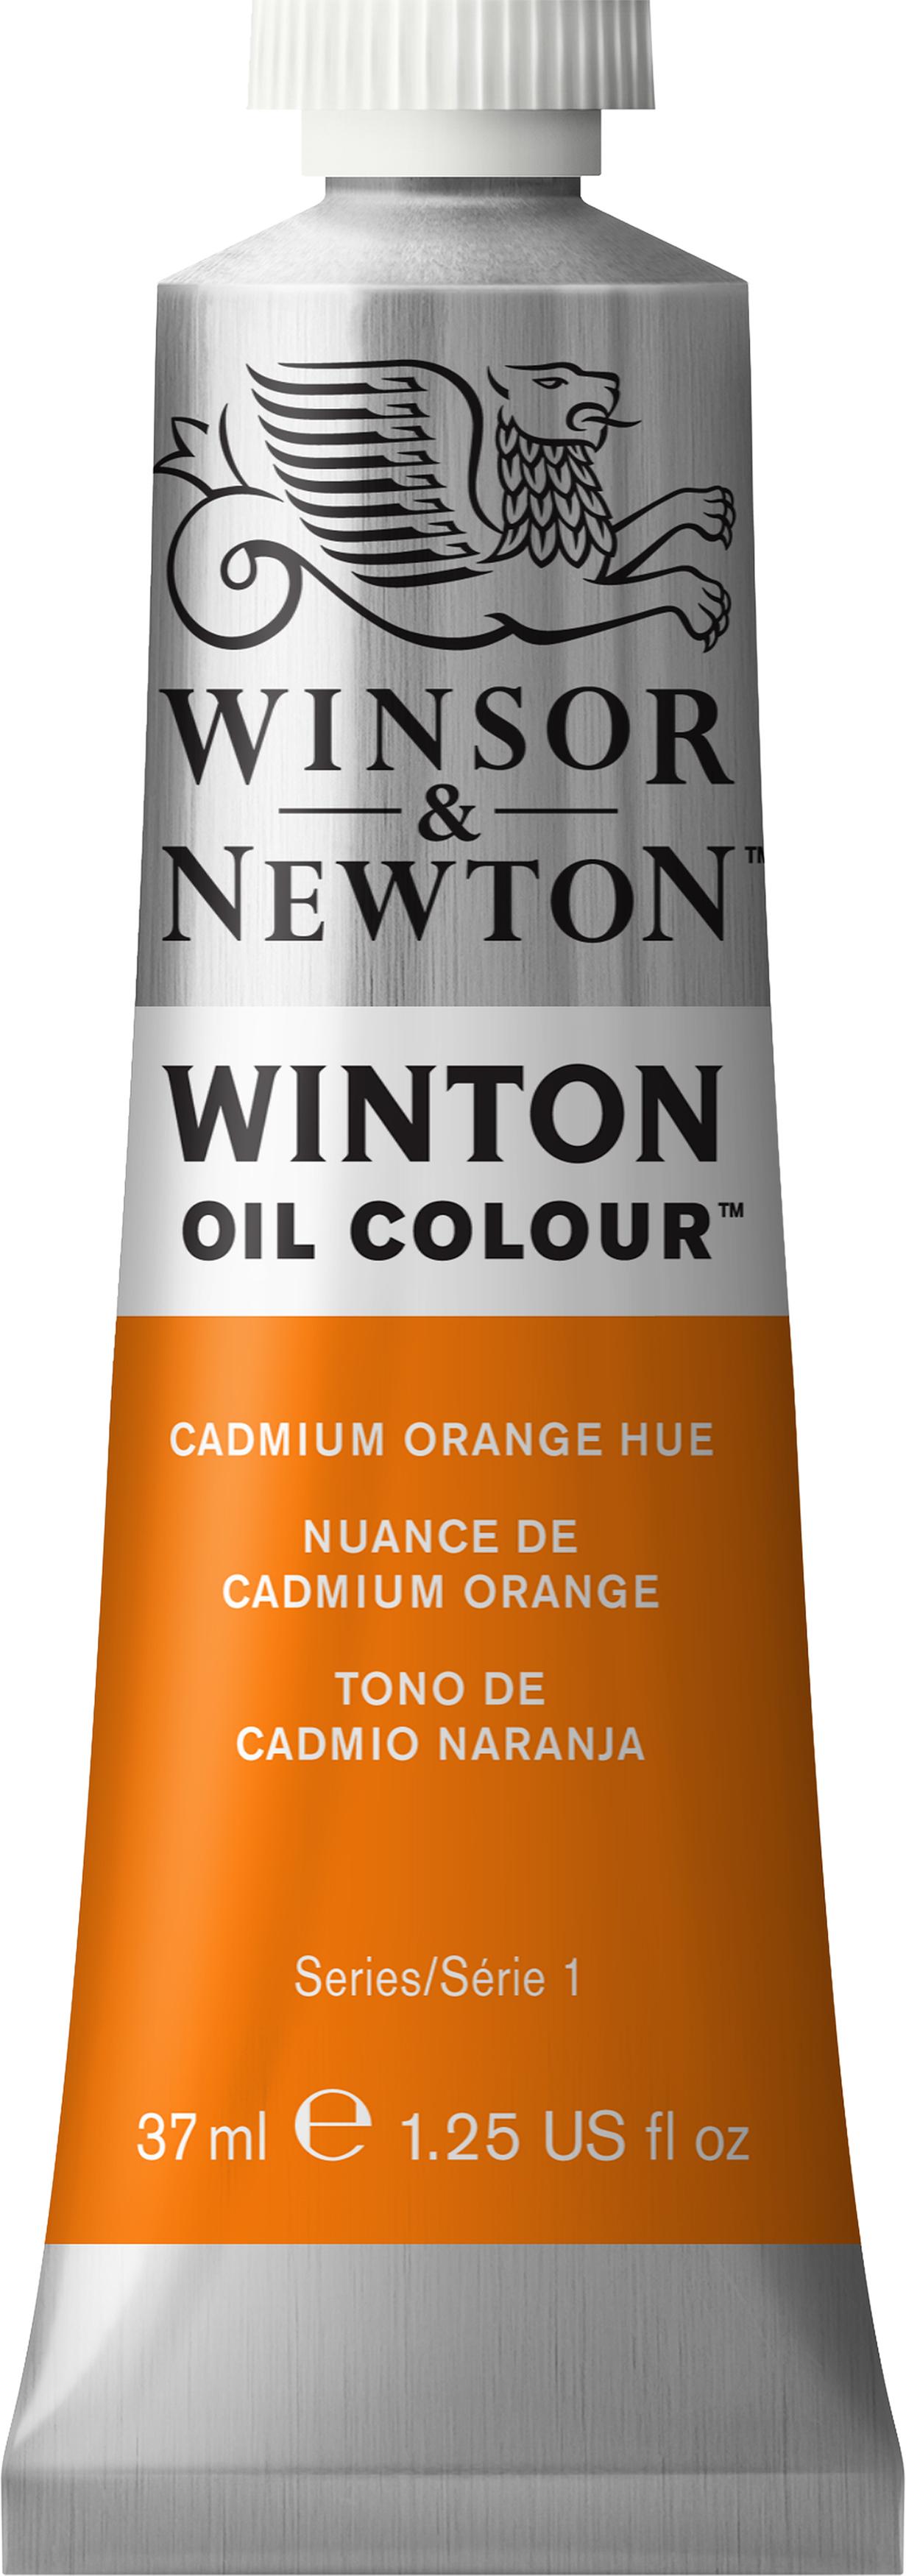 Winsor & Newton Winton Oil Colour 37ml - 33 COLORS